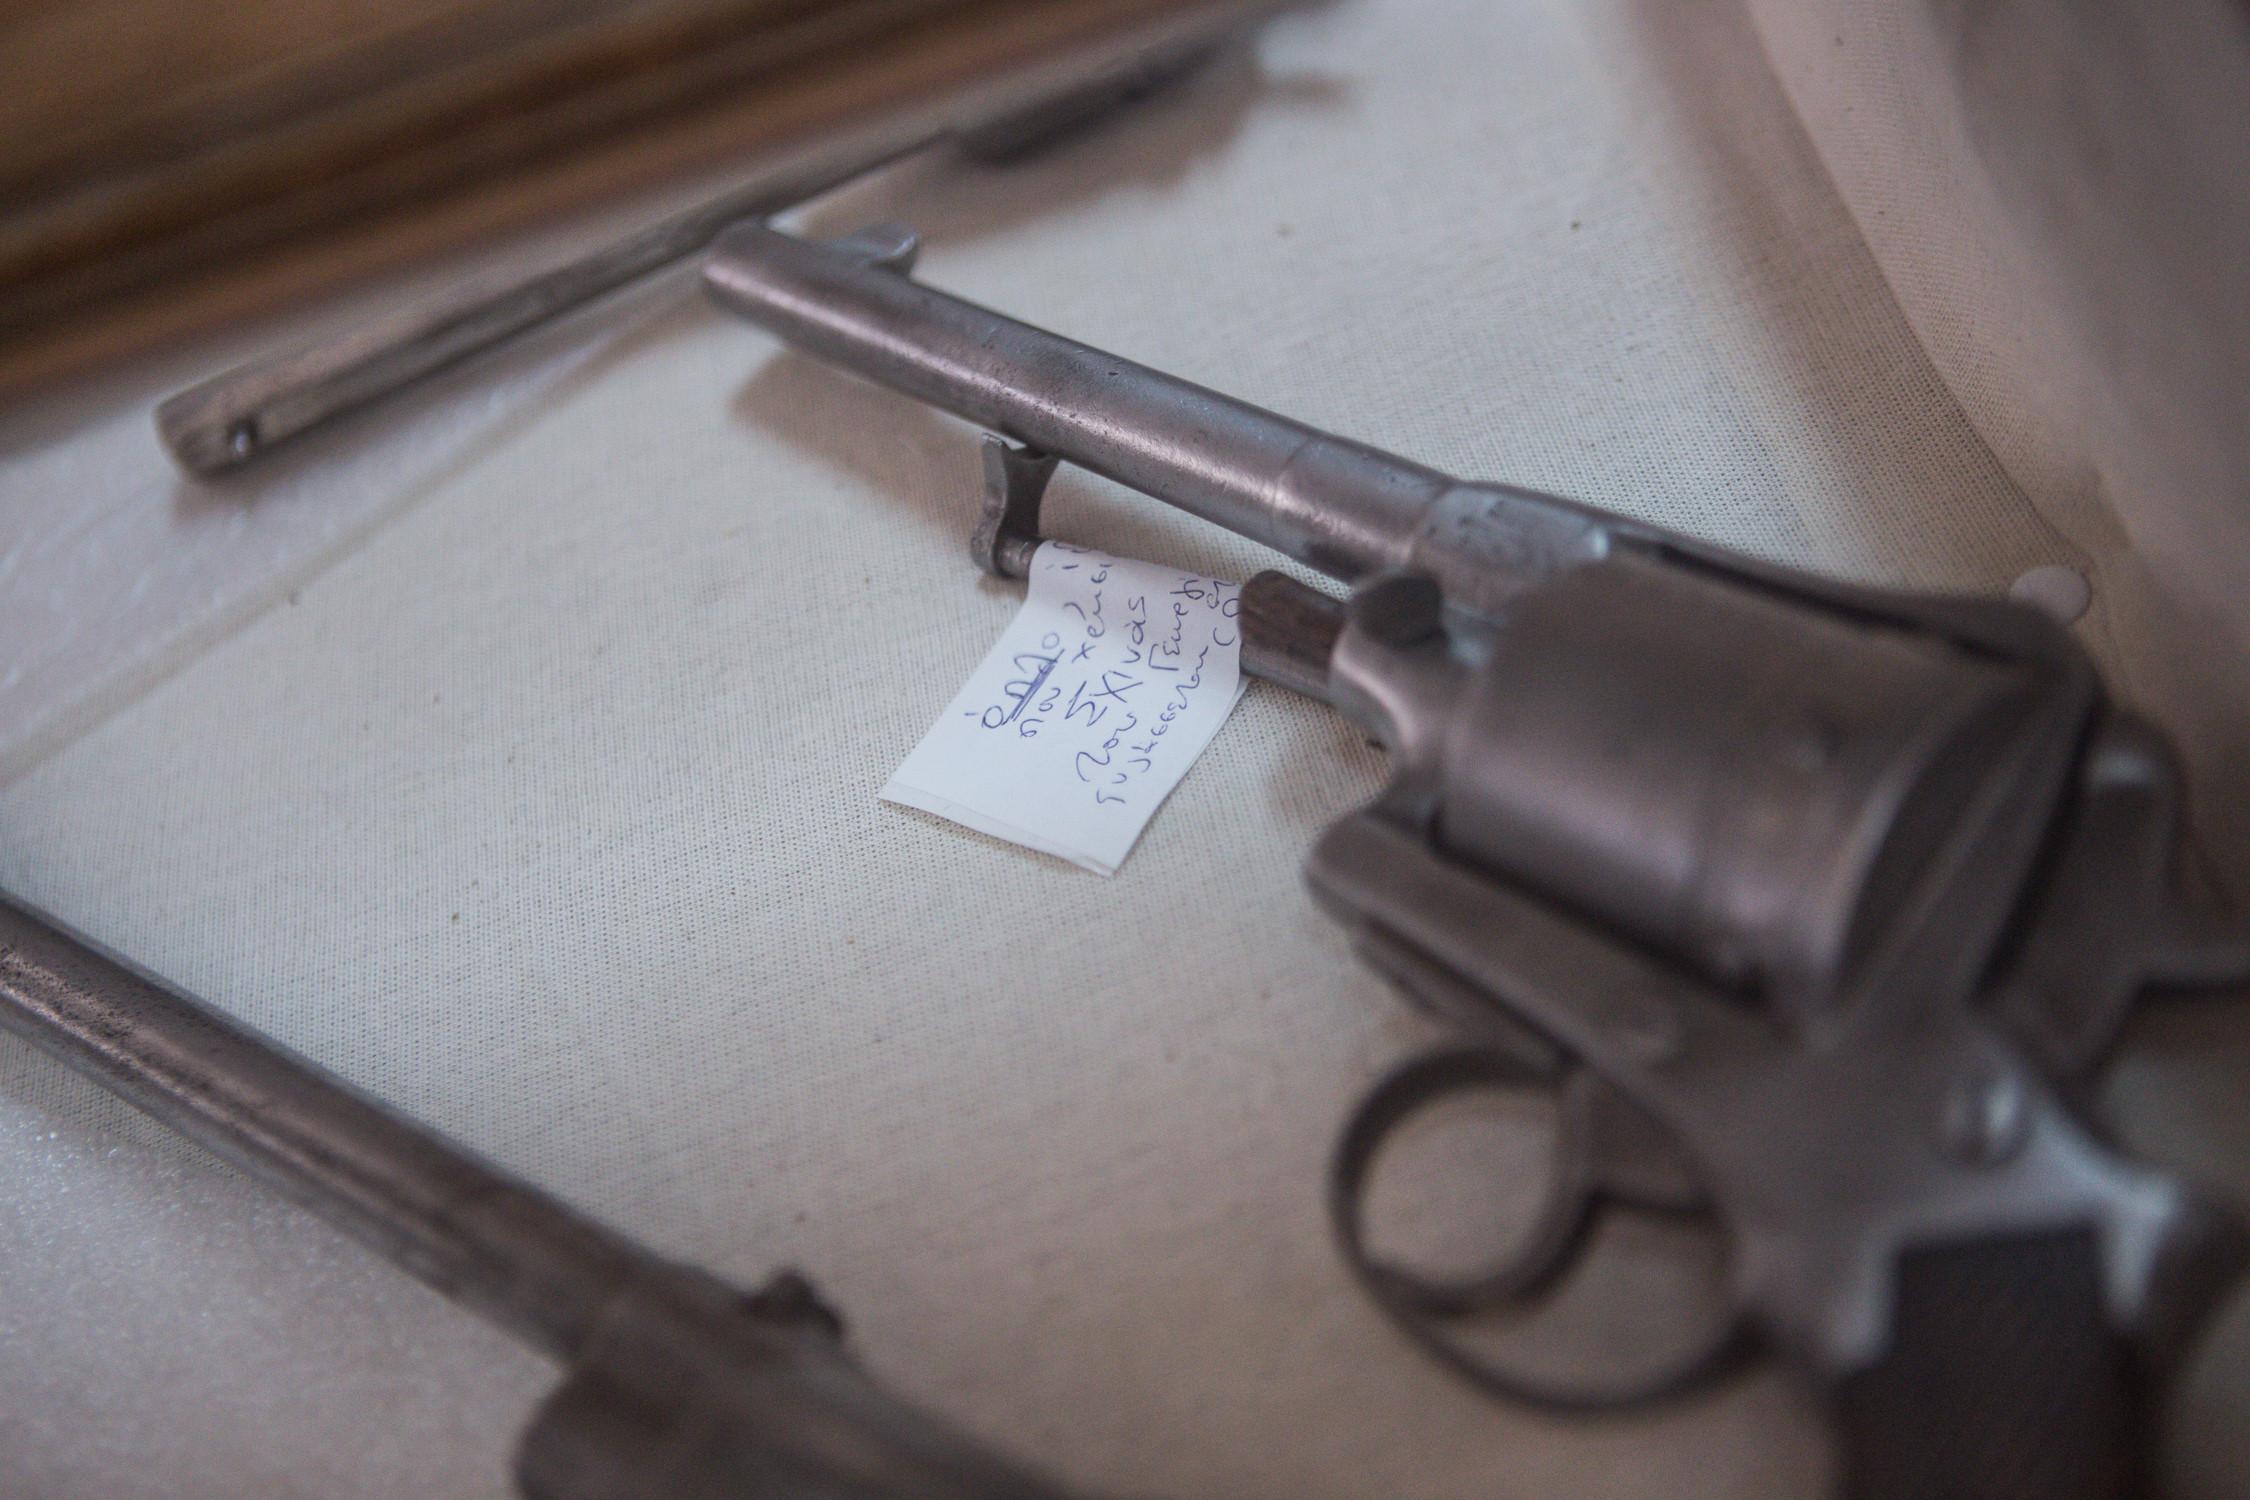 pistoli sxoina